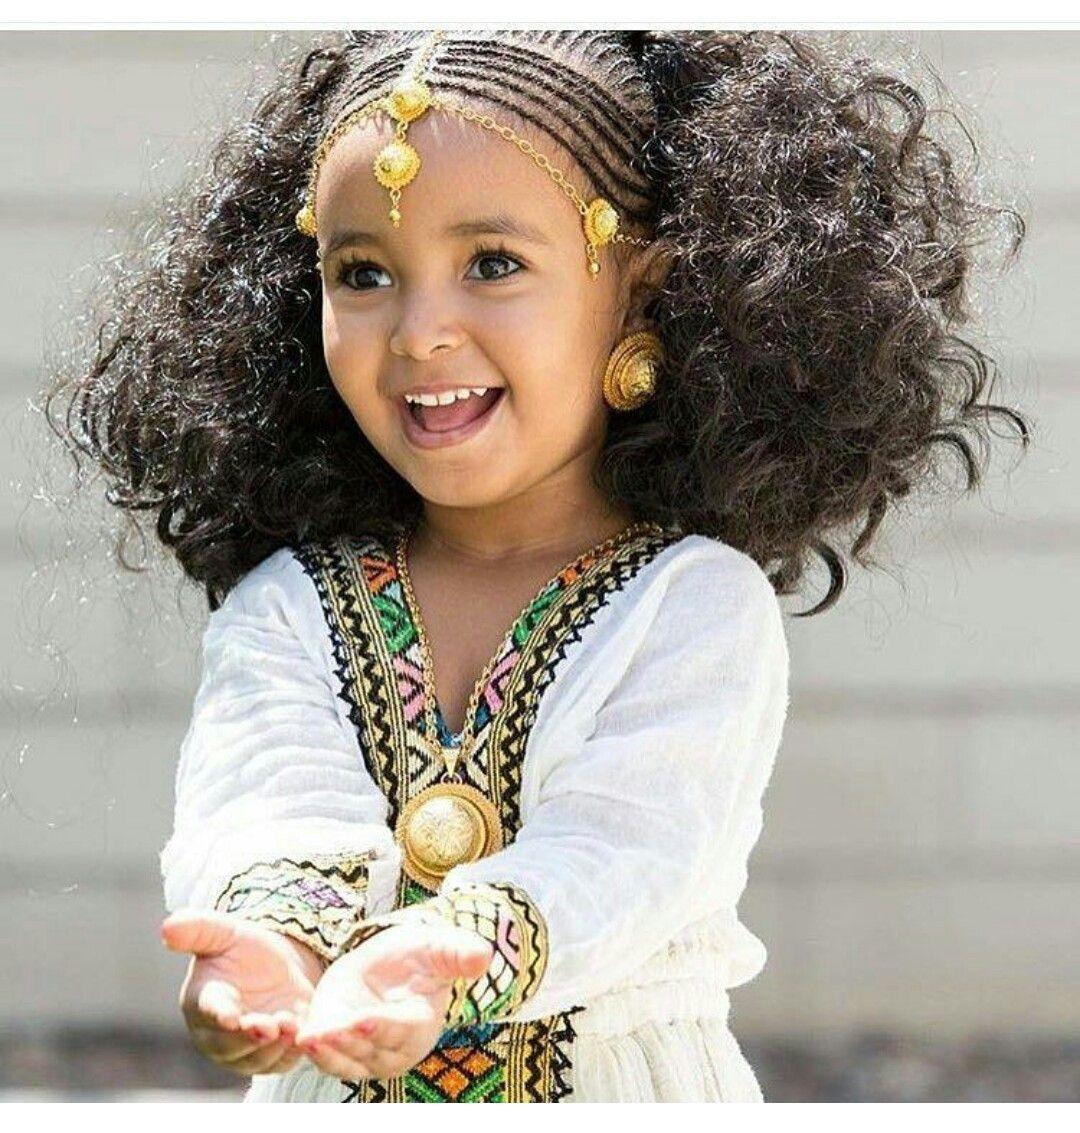 africanamericankids #mixedkids #biracial | cute shots | kids